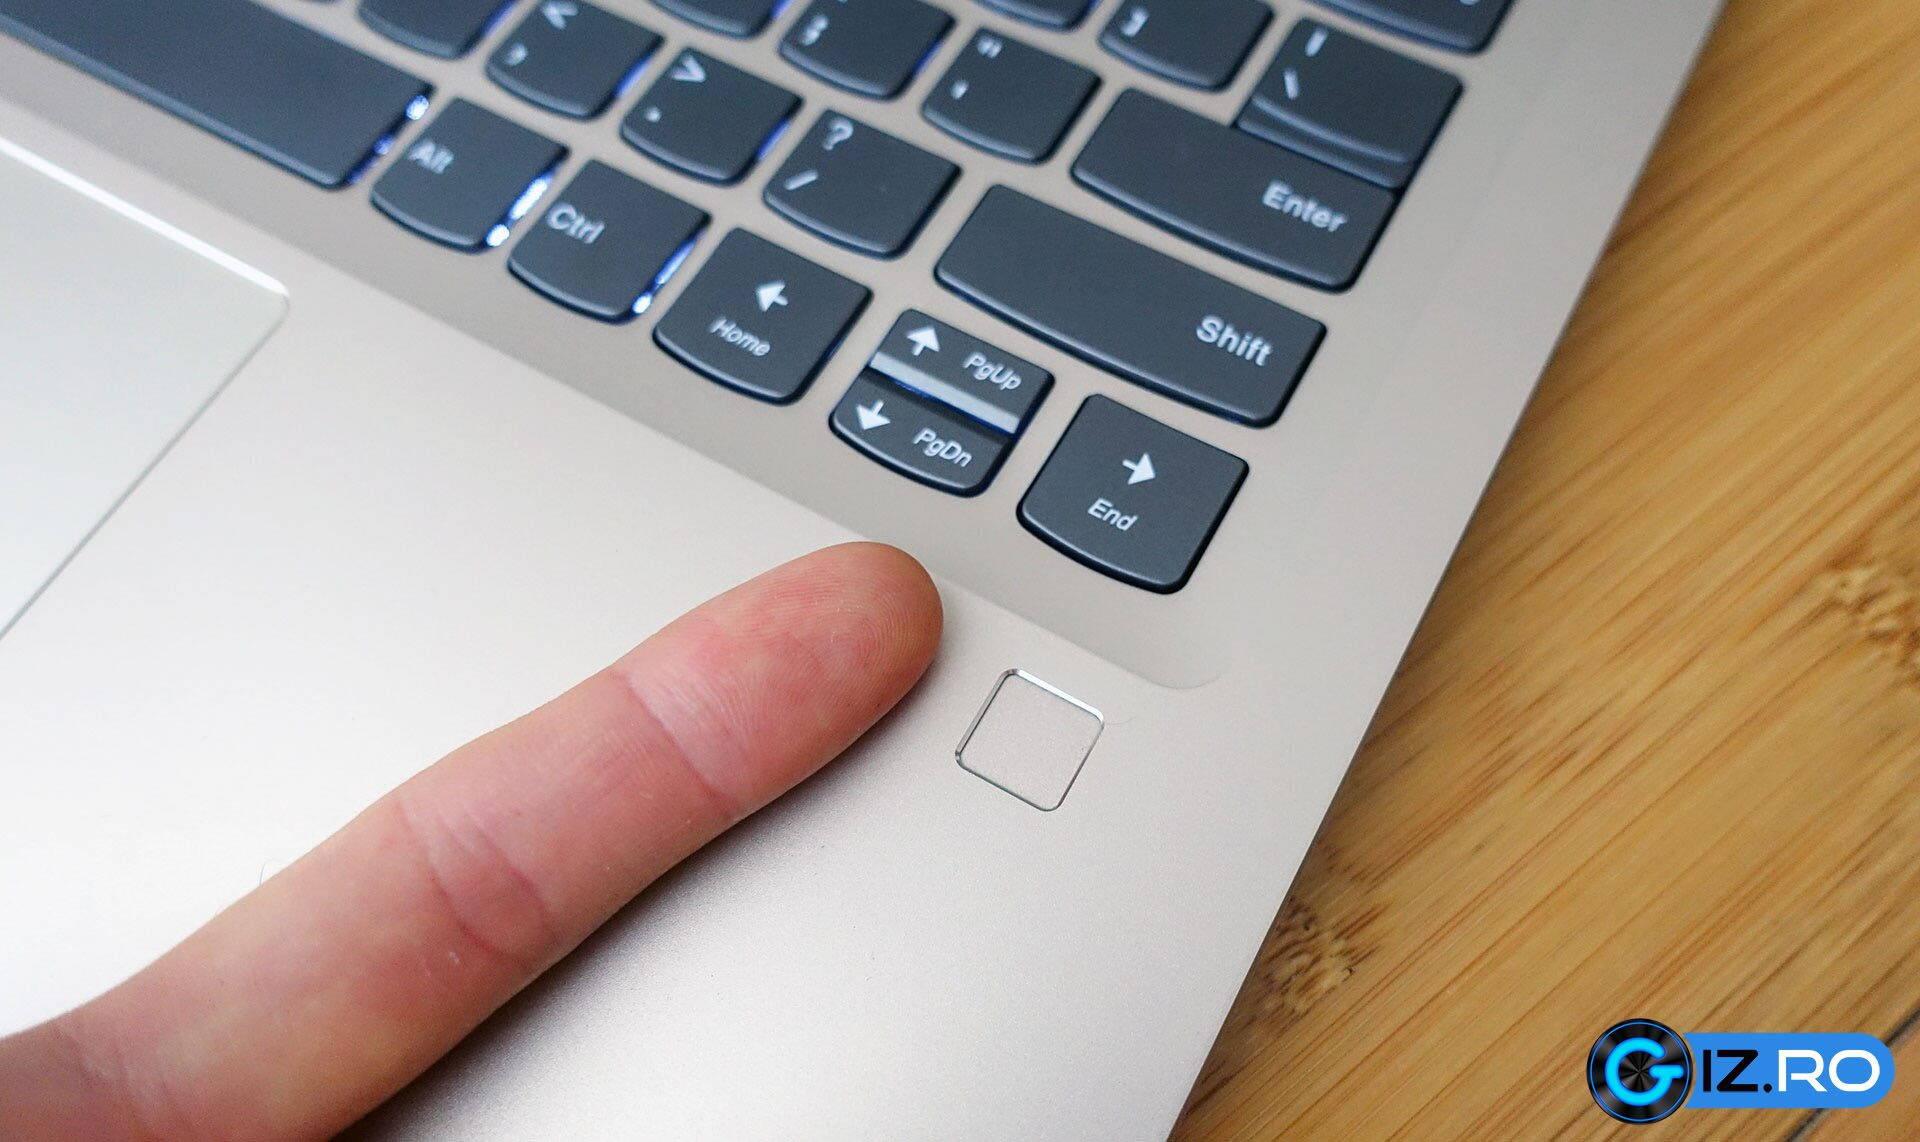 lenovo-ideapad-720s-finger-sensor